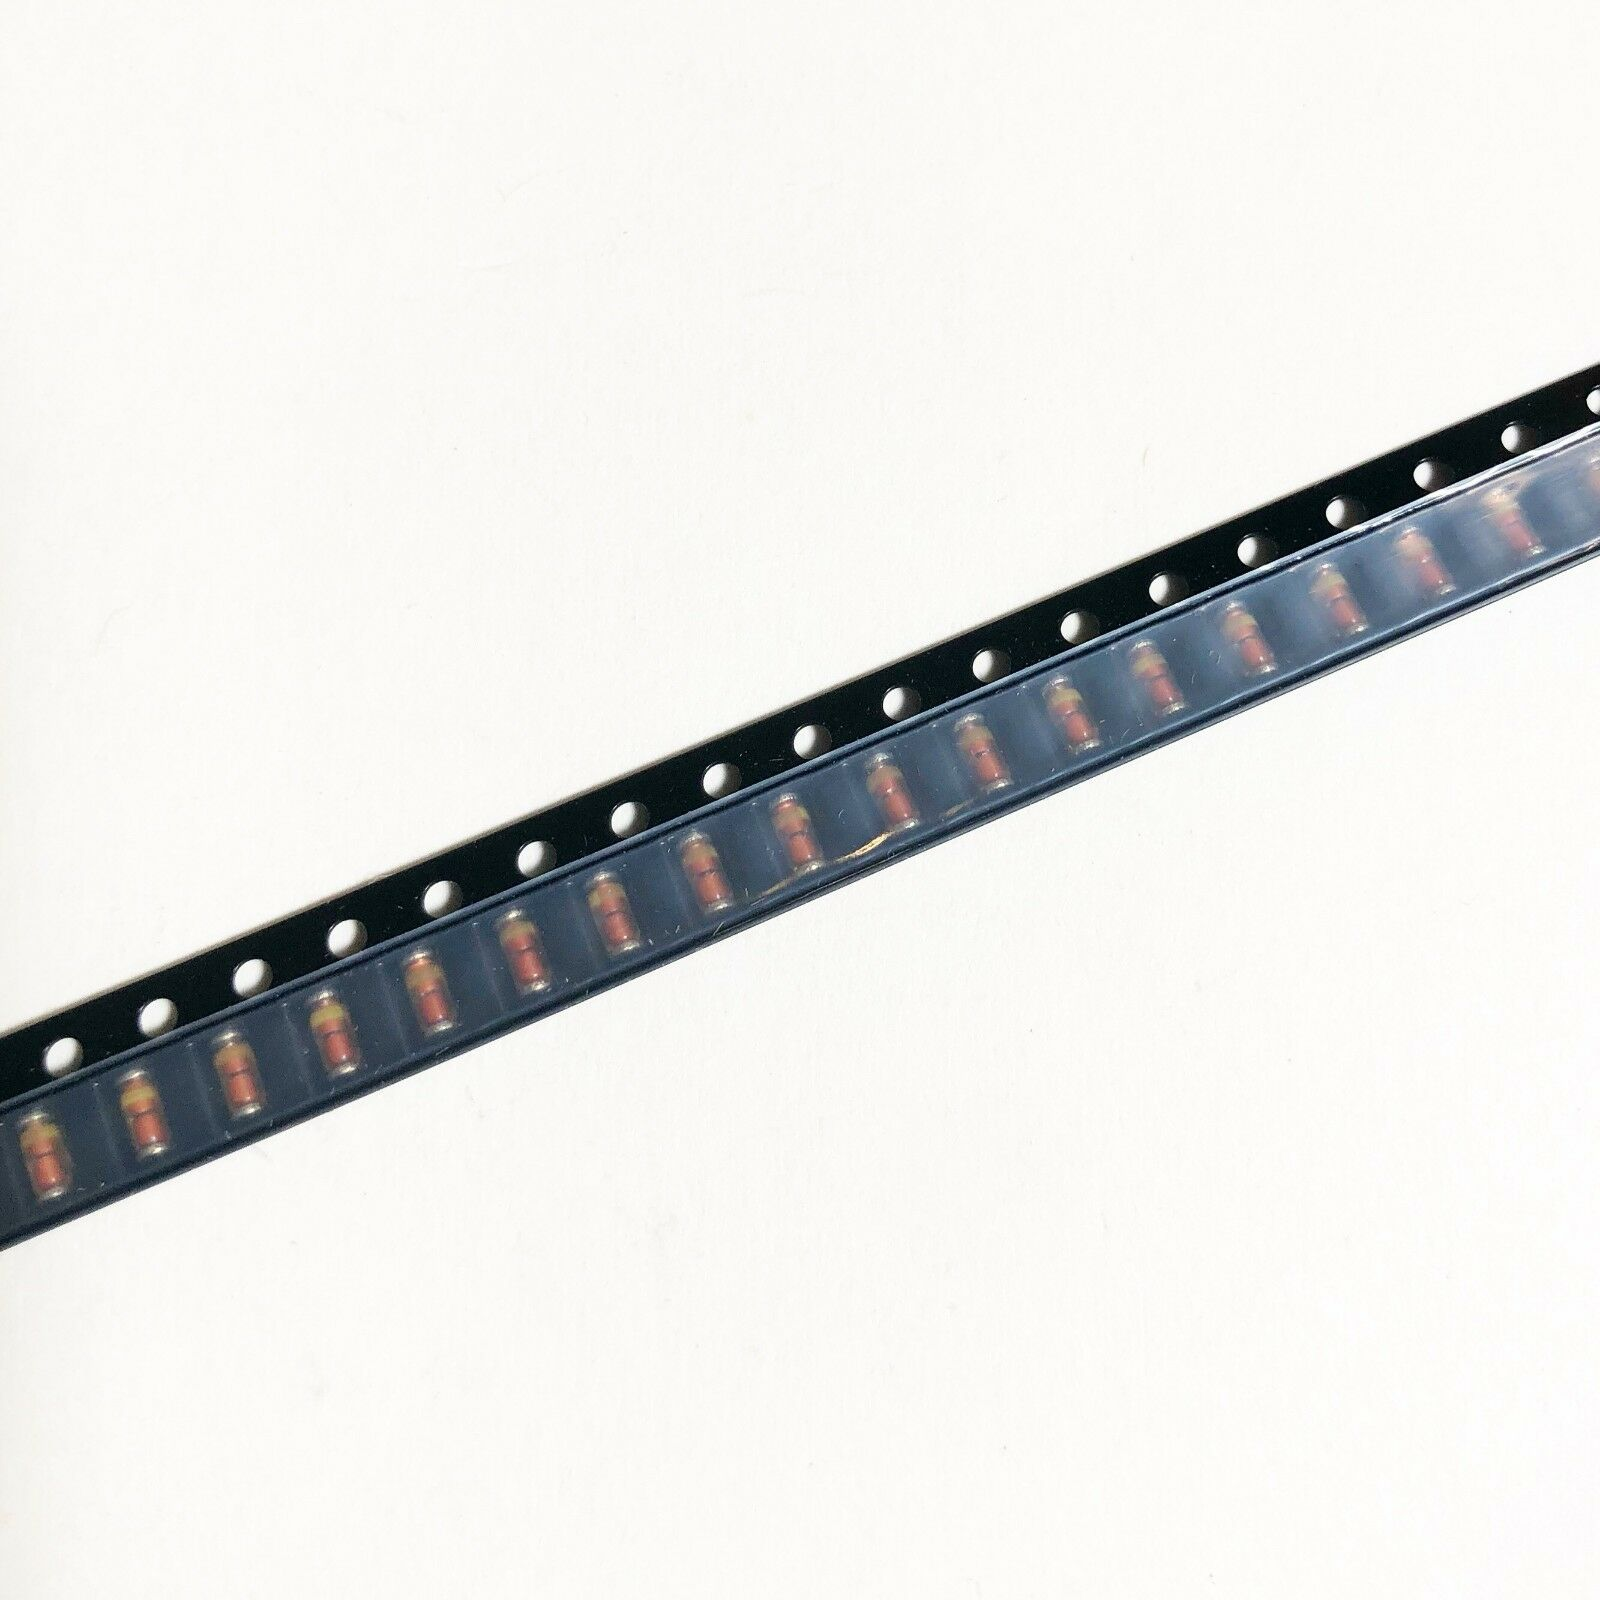 500MW NXP 12V DIODE ZENER SOD-80C-2 BZV55-B12,115